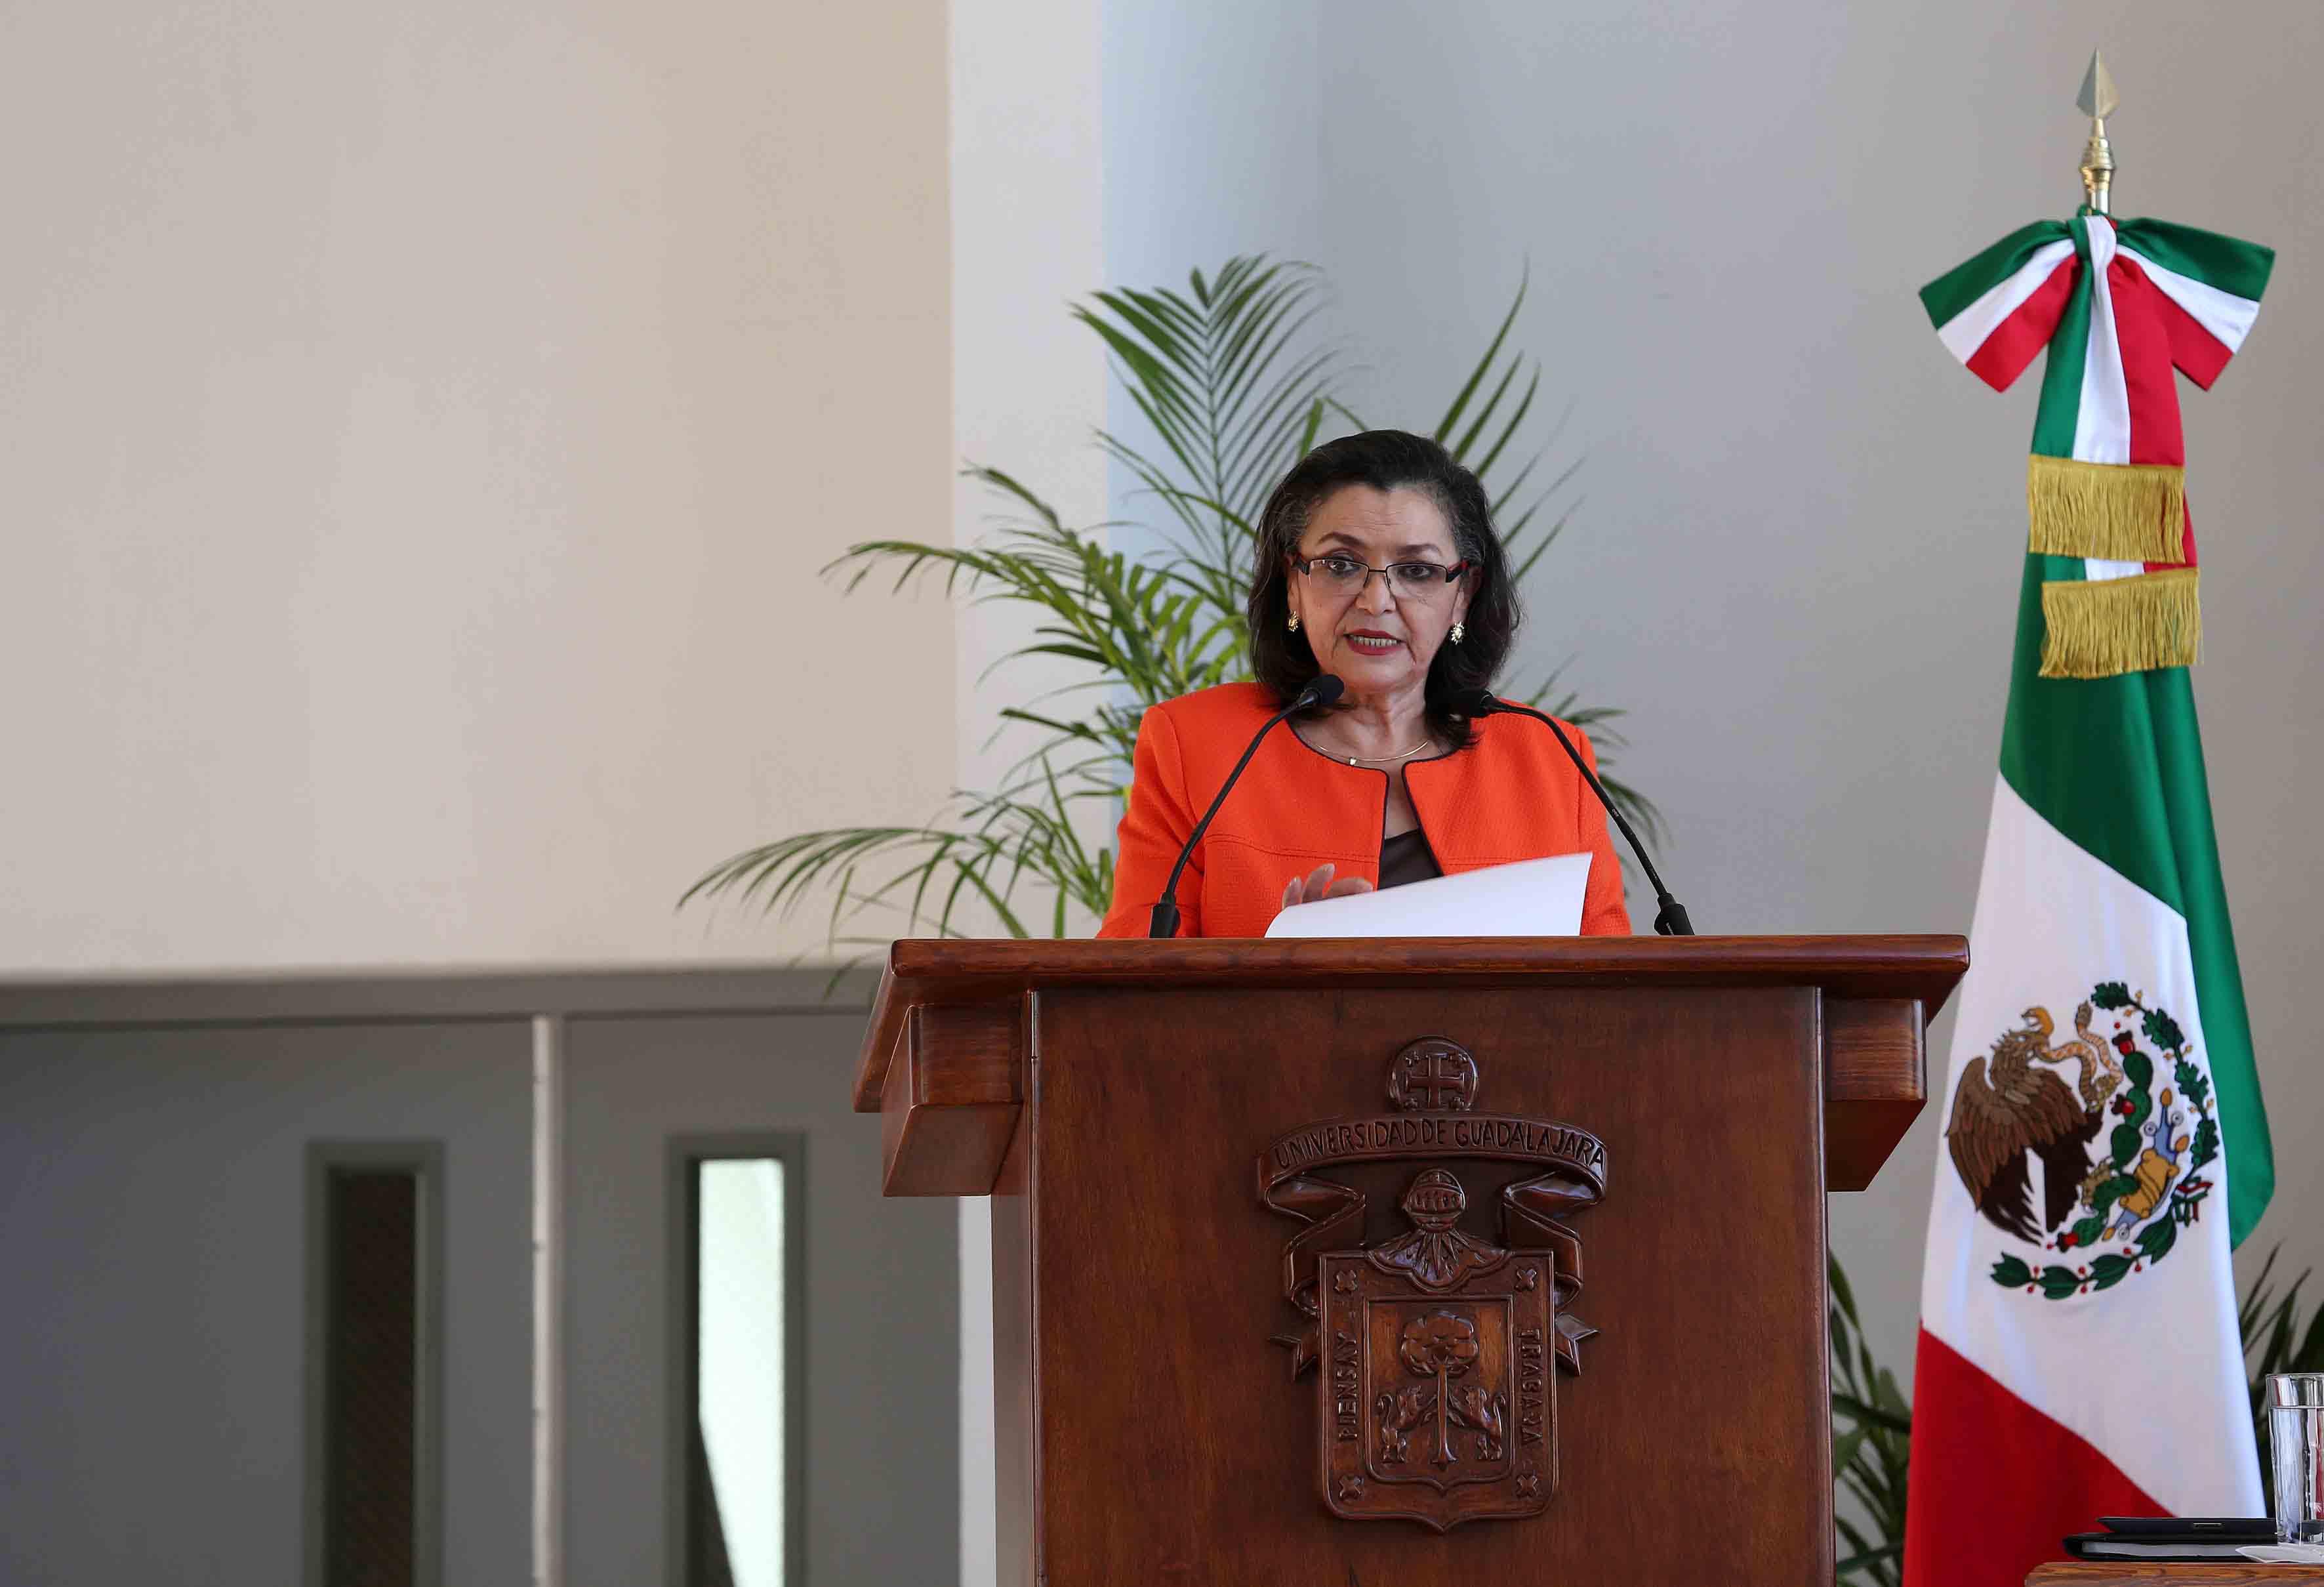 Dra. Ruth Padilla Muños hablando frente al microfono